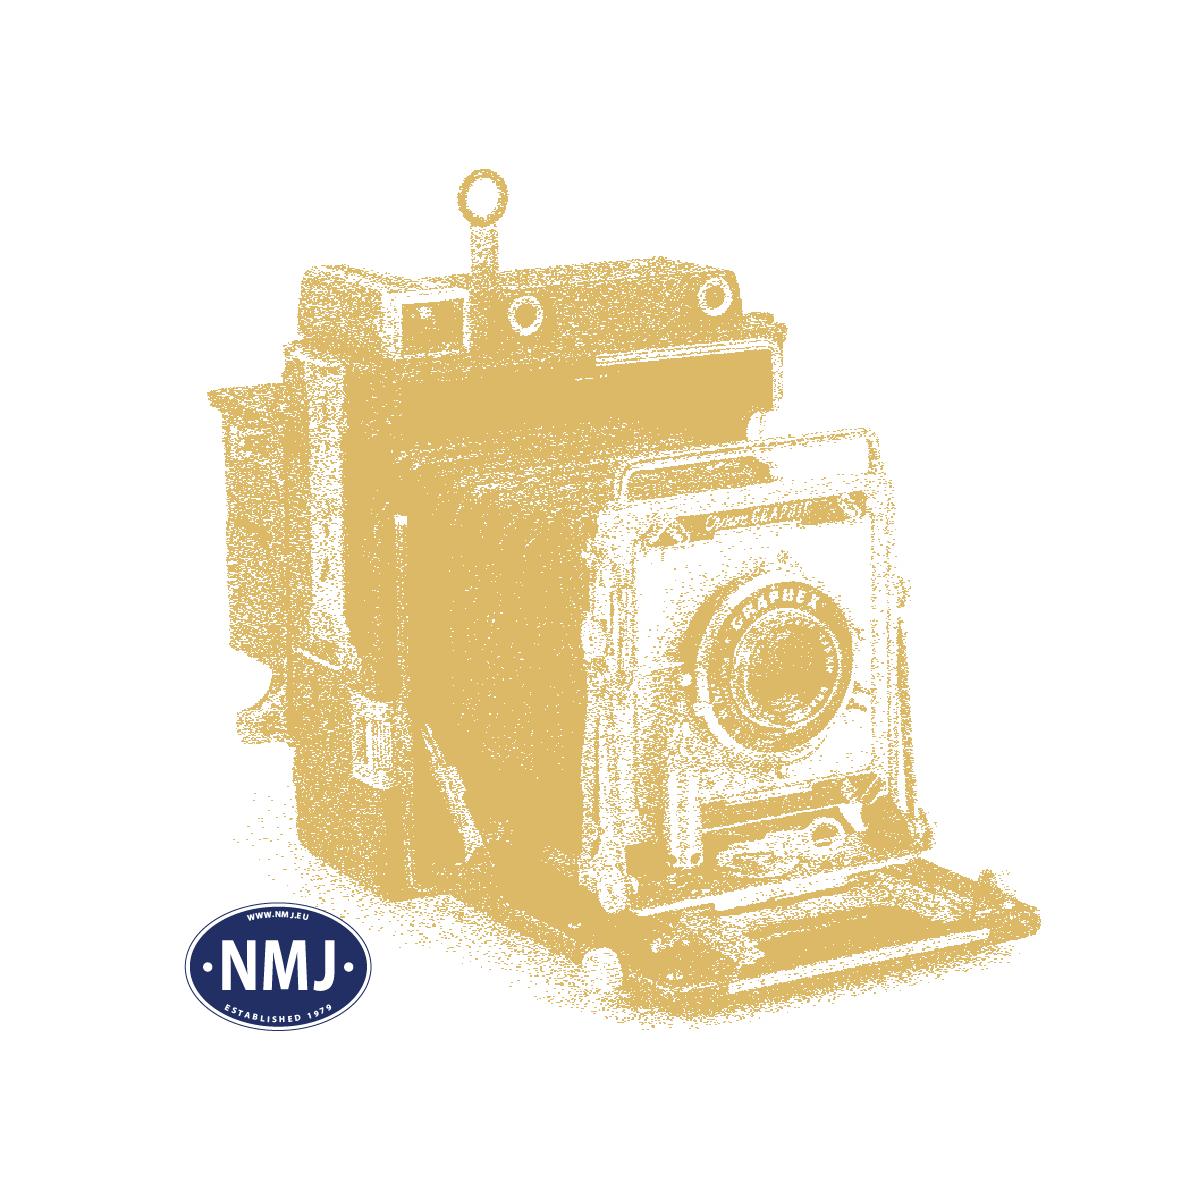 NMJE501439 - NMJ Exclusive SZD WLABm UIC Y, Copenhagen-Moscow, Sleeper